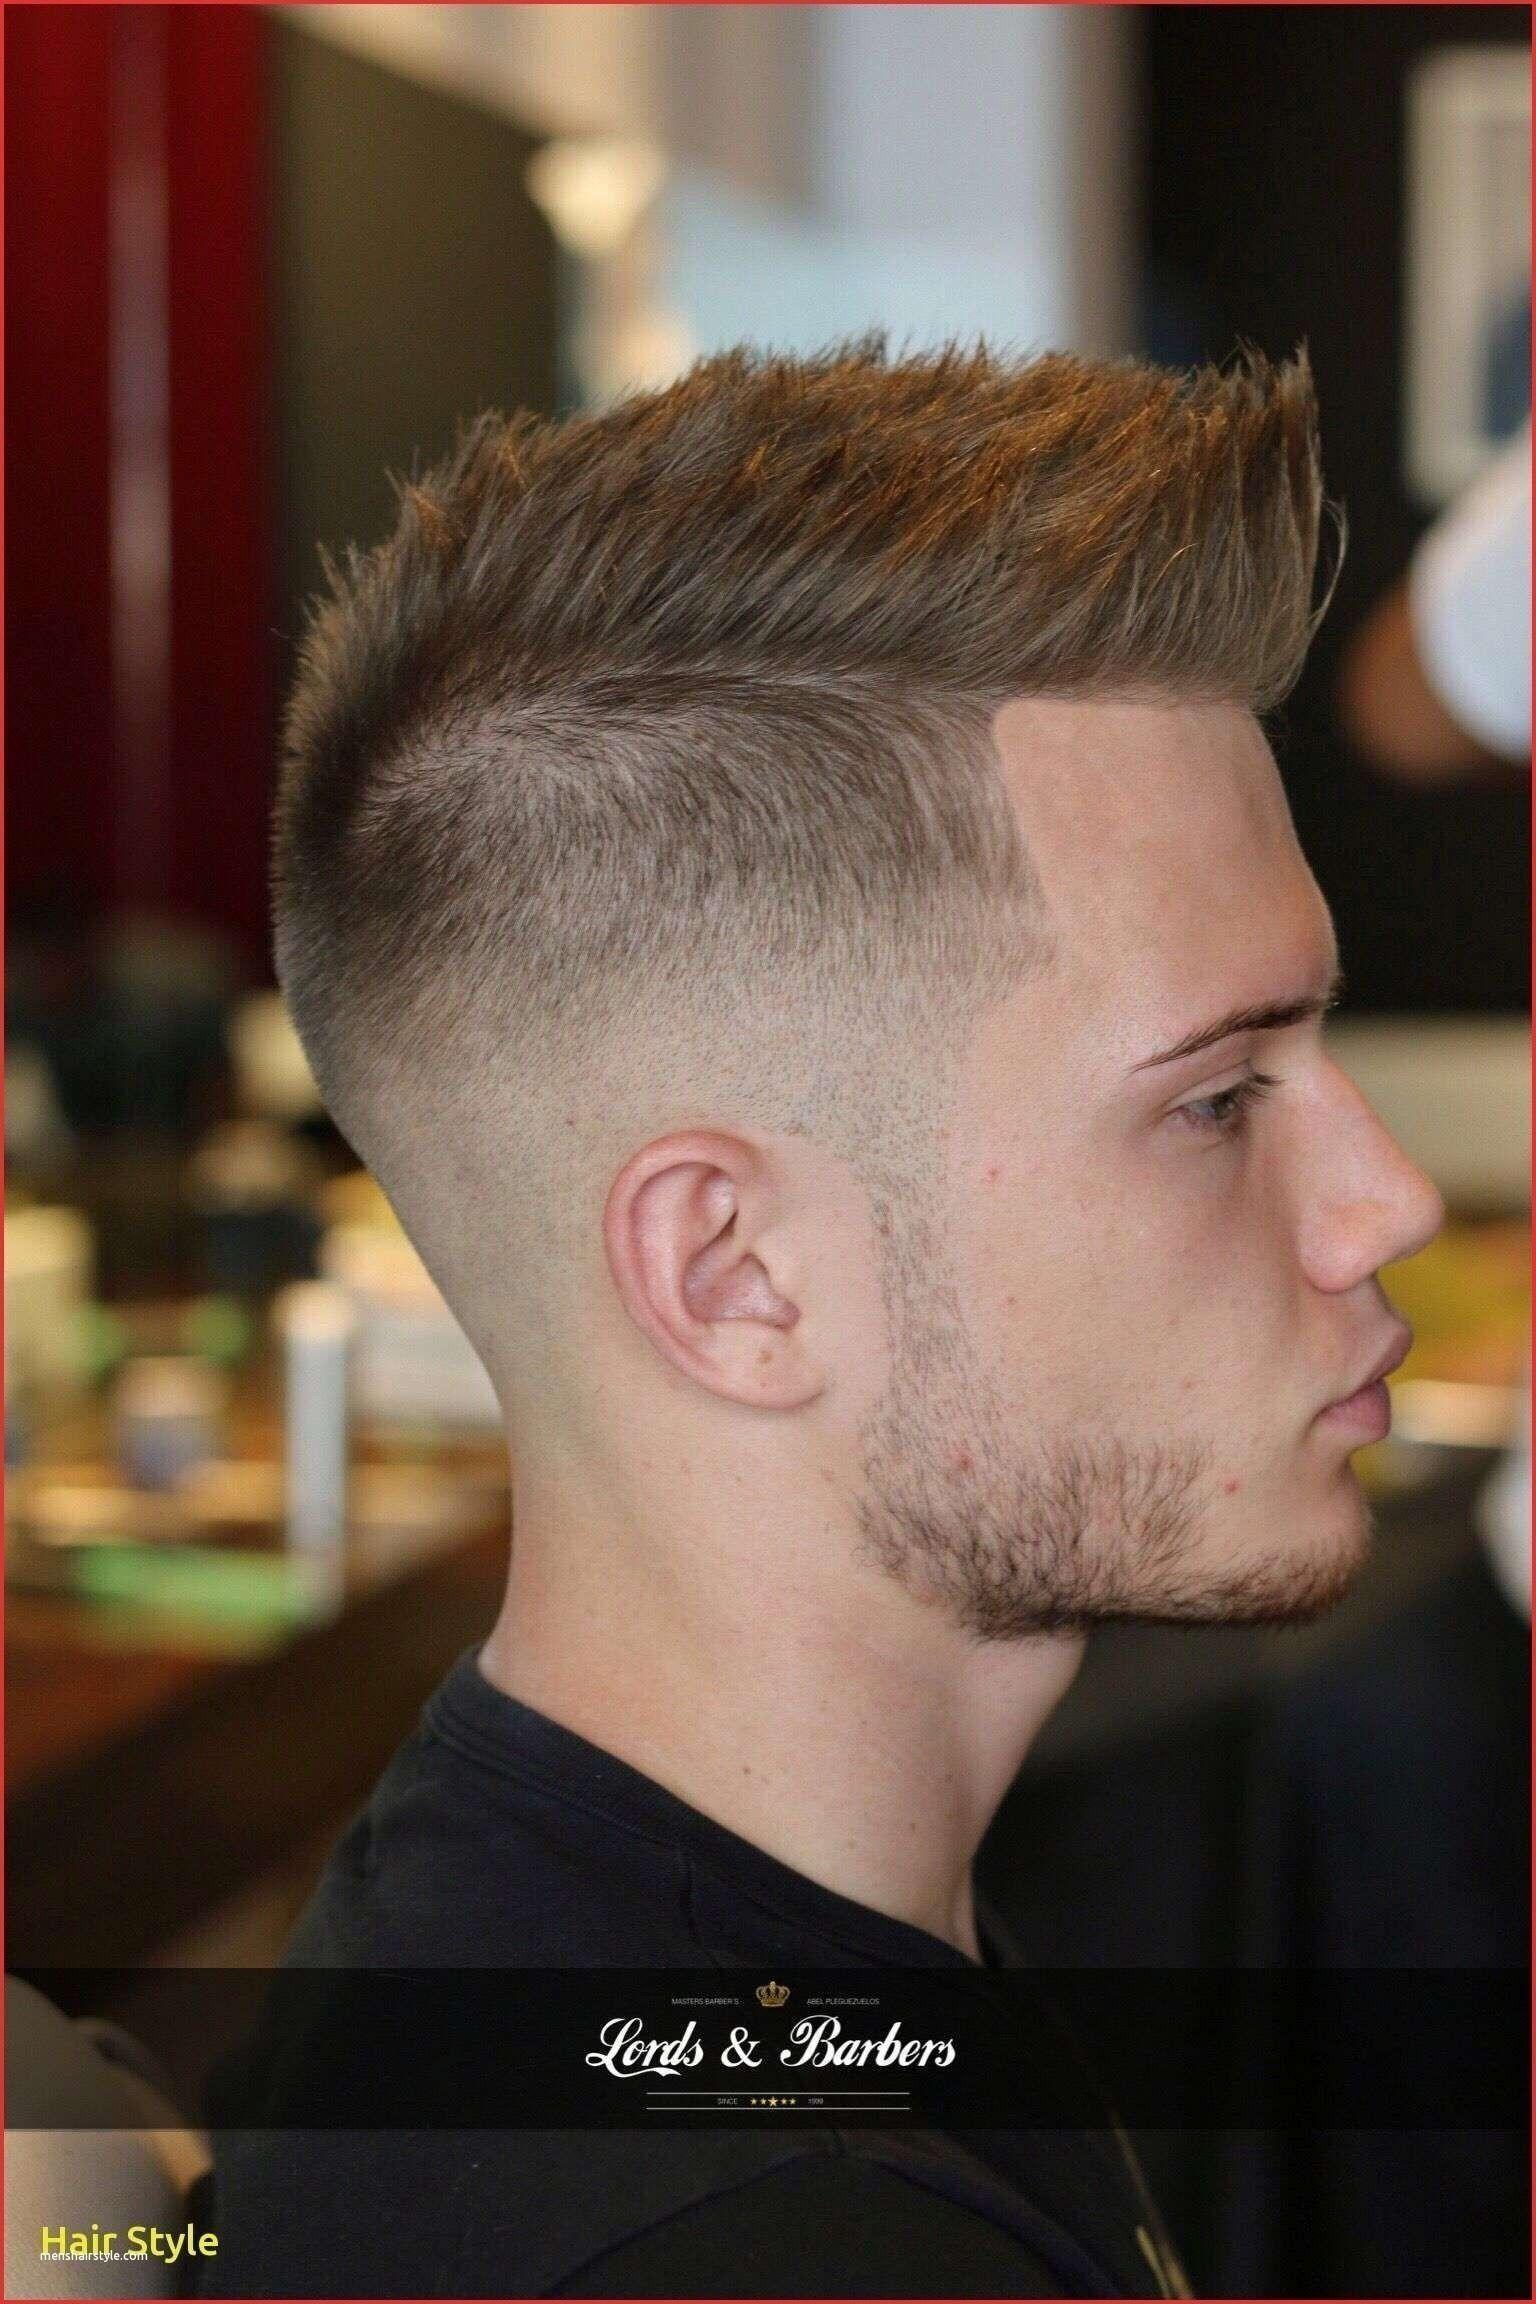 Gentleman Haircut Styles 2019 Beautiful Best Haircut Style 2019 Of Gentleman Hai Gentleman In 2020 Gentleman Haircut Fade Haircut Mens Hairstyles